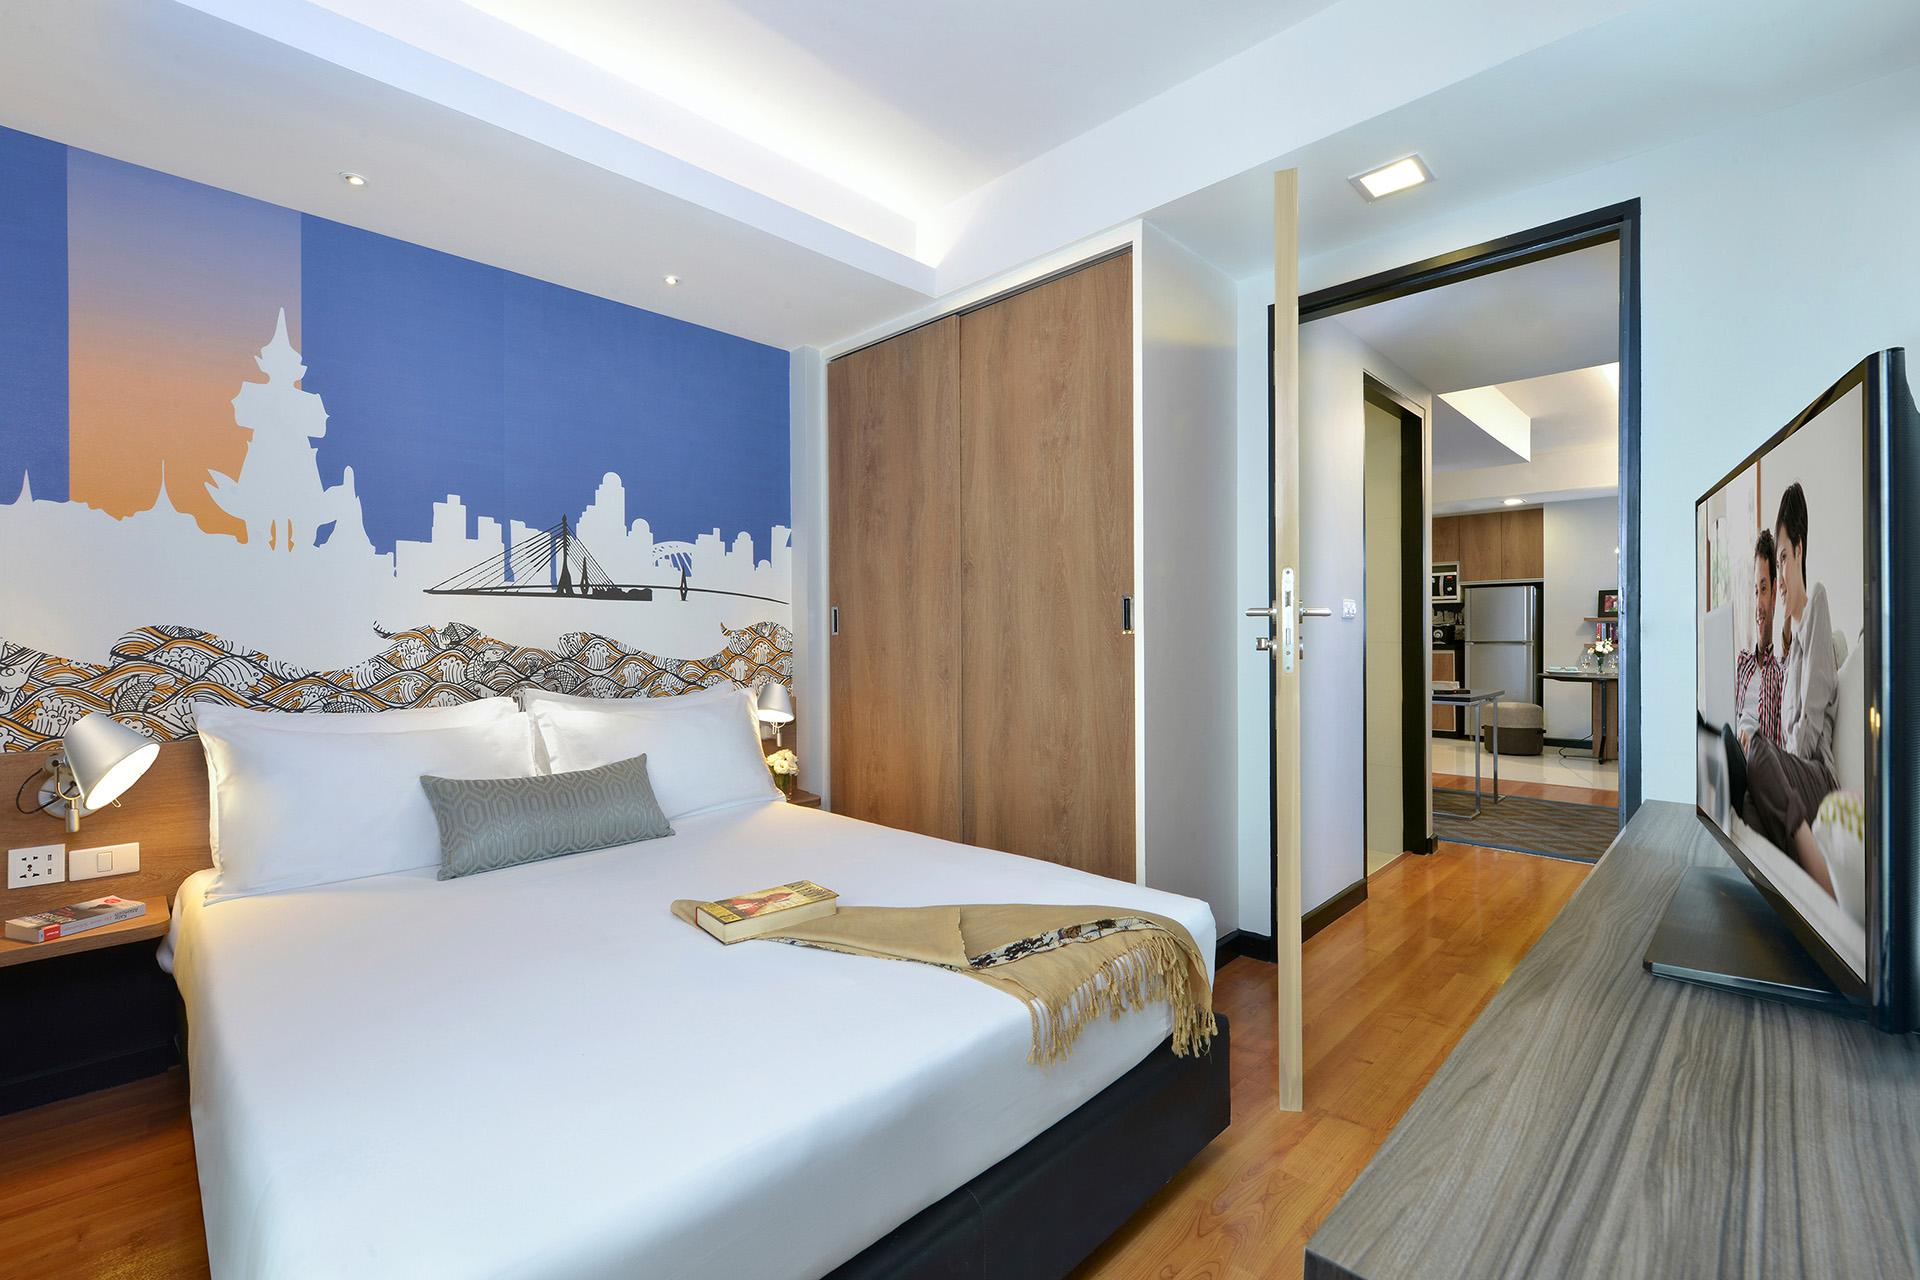 Bedroom at Citadines Sukhumvit 11 Apartments